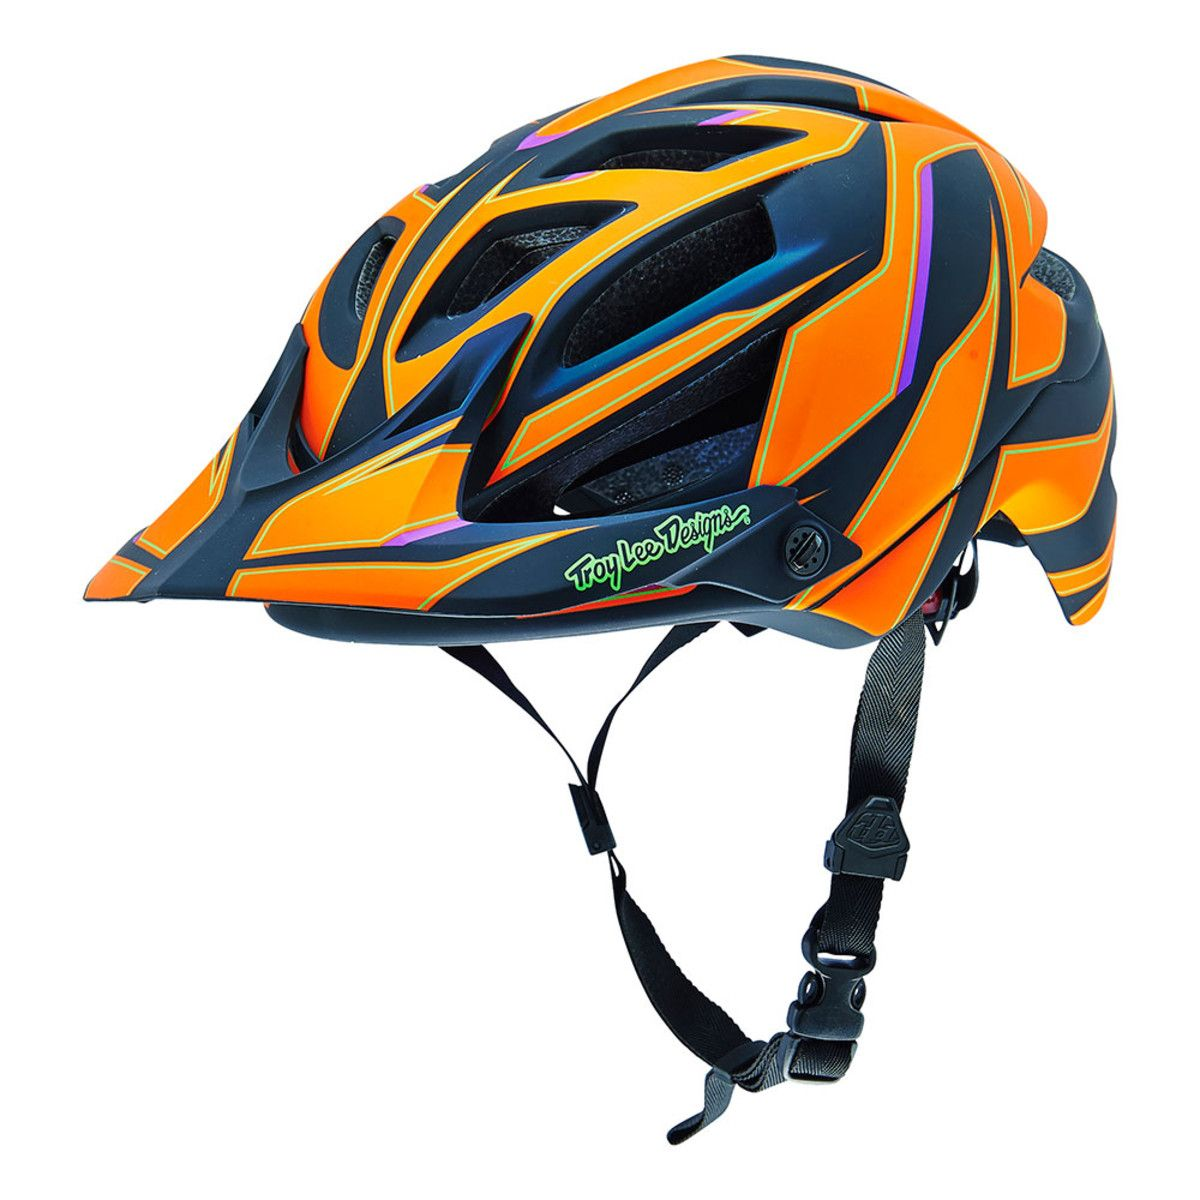 Troy Lee Designs A1 REFLEX orange